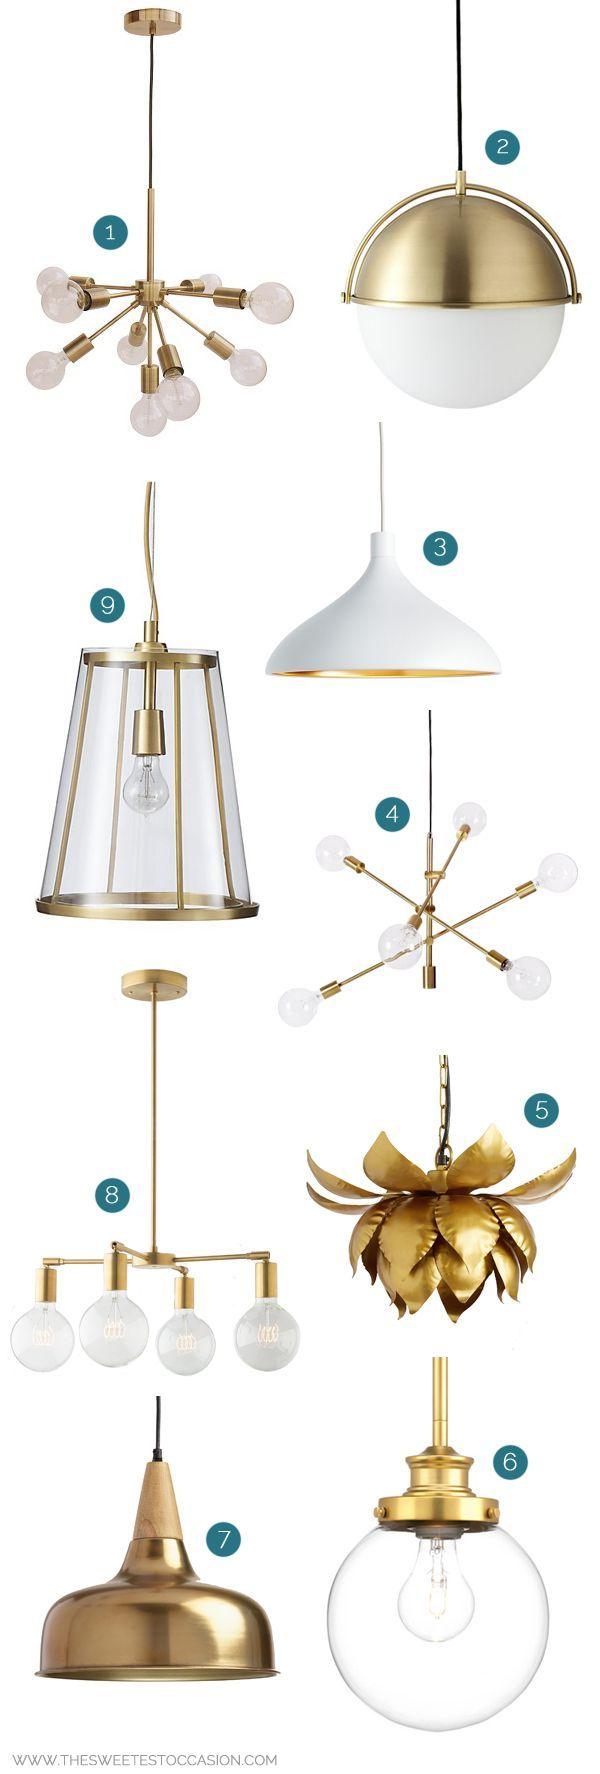 Brass lighting roundup brass chandelier hardware and chandeliers arubaitofo Choice Image